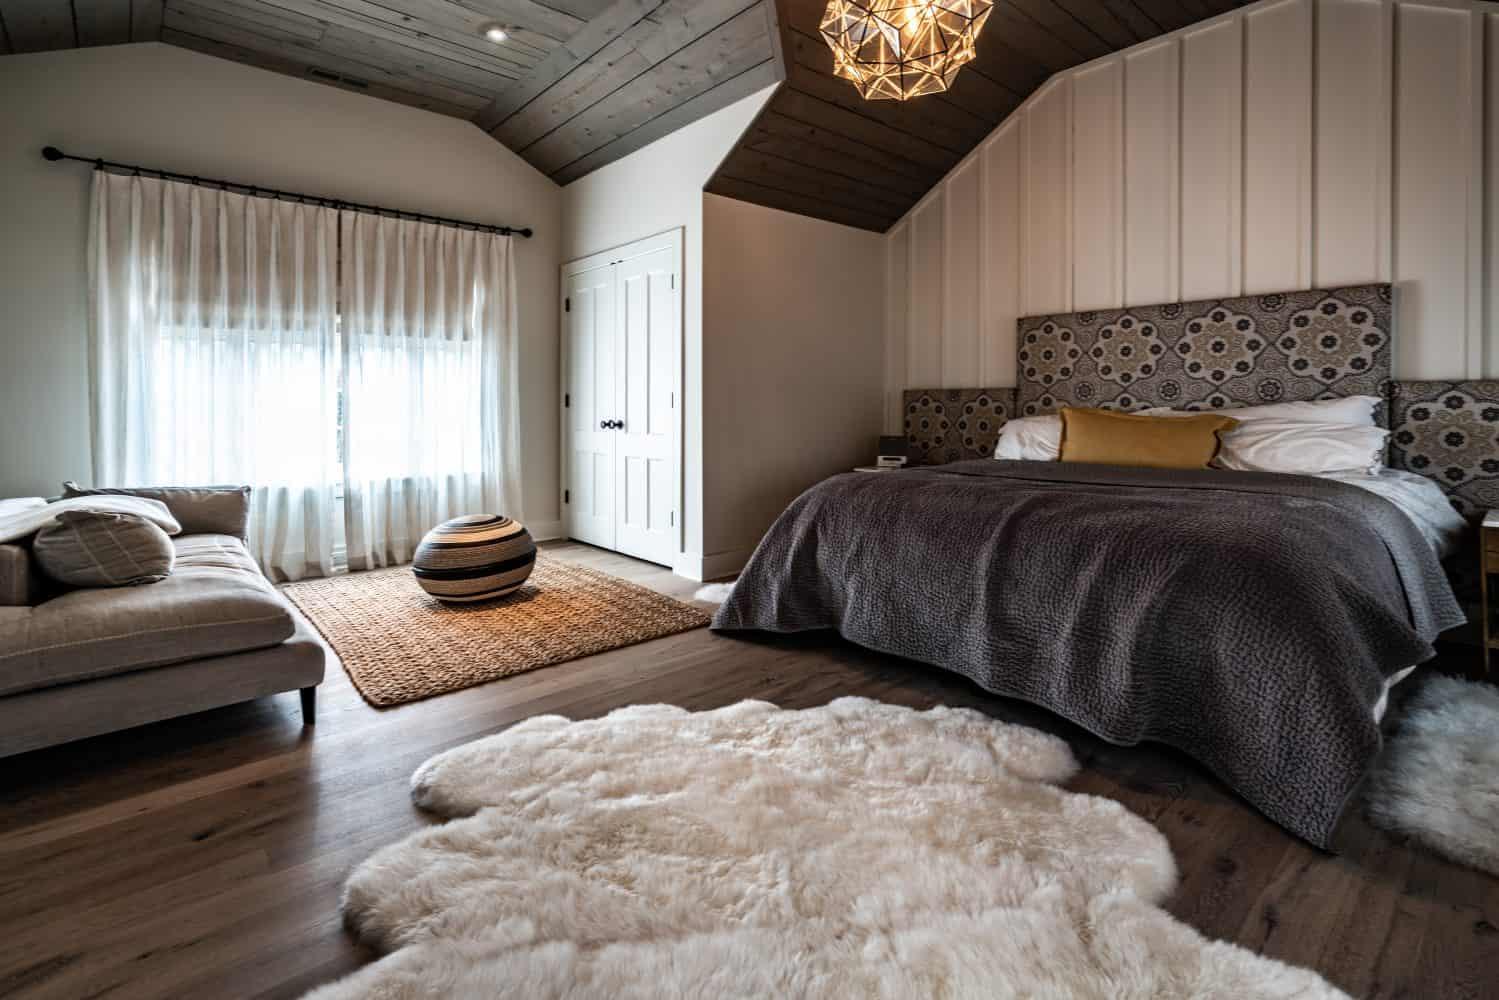 bedroom renovation contractor Milford, CT